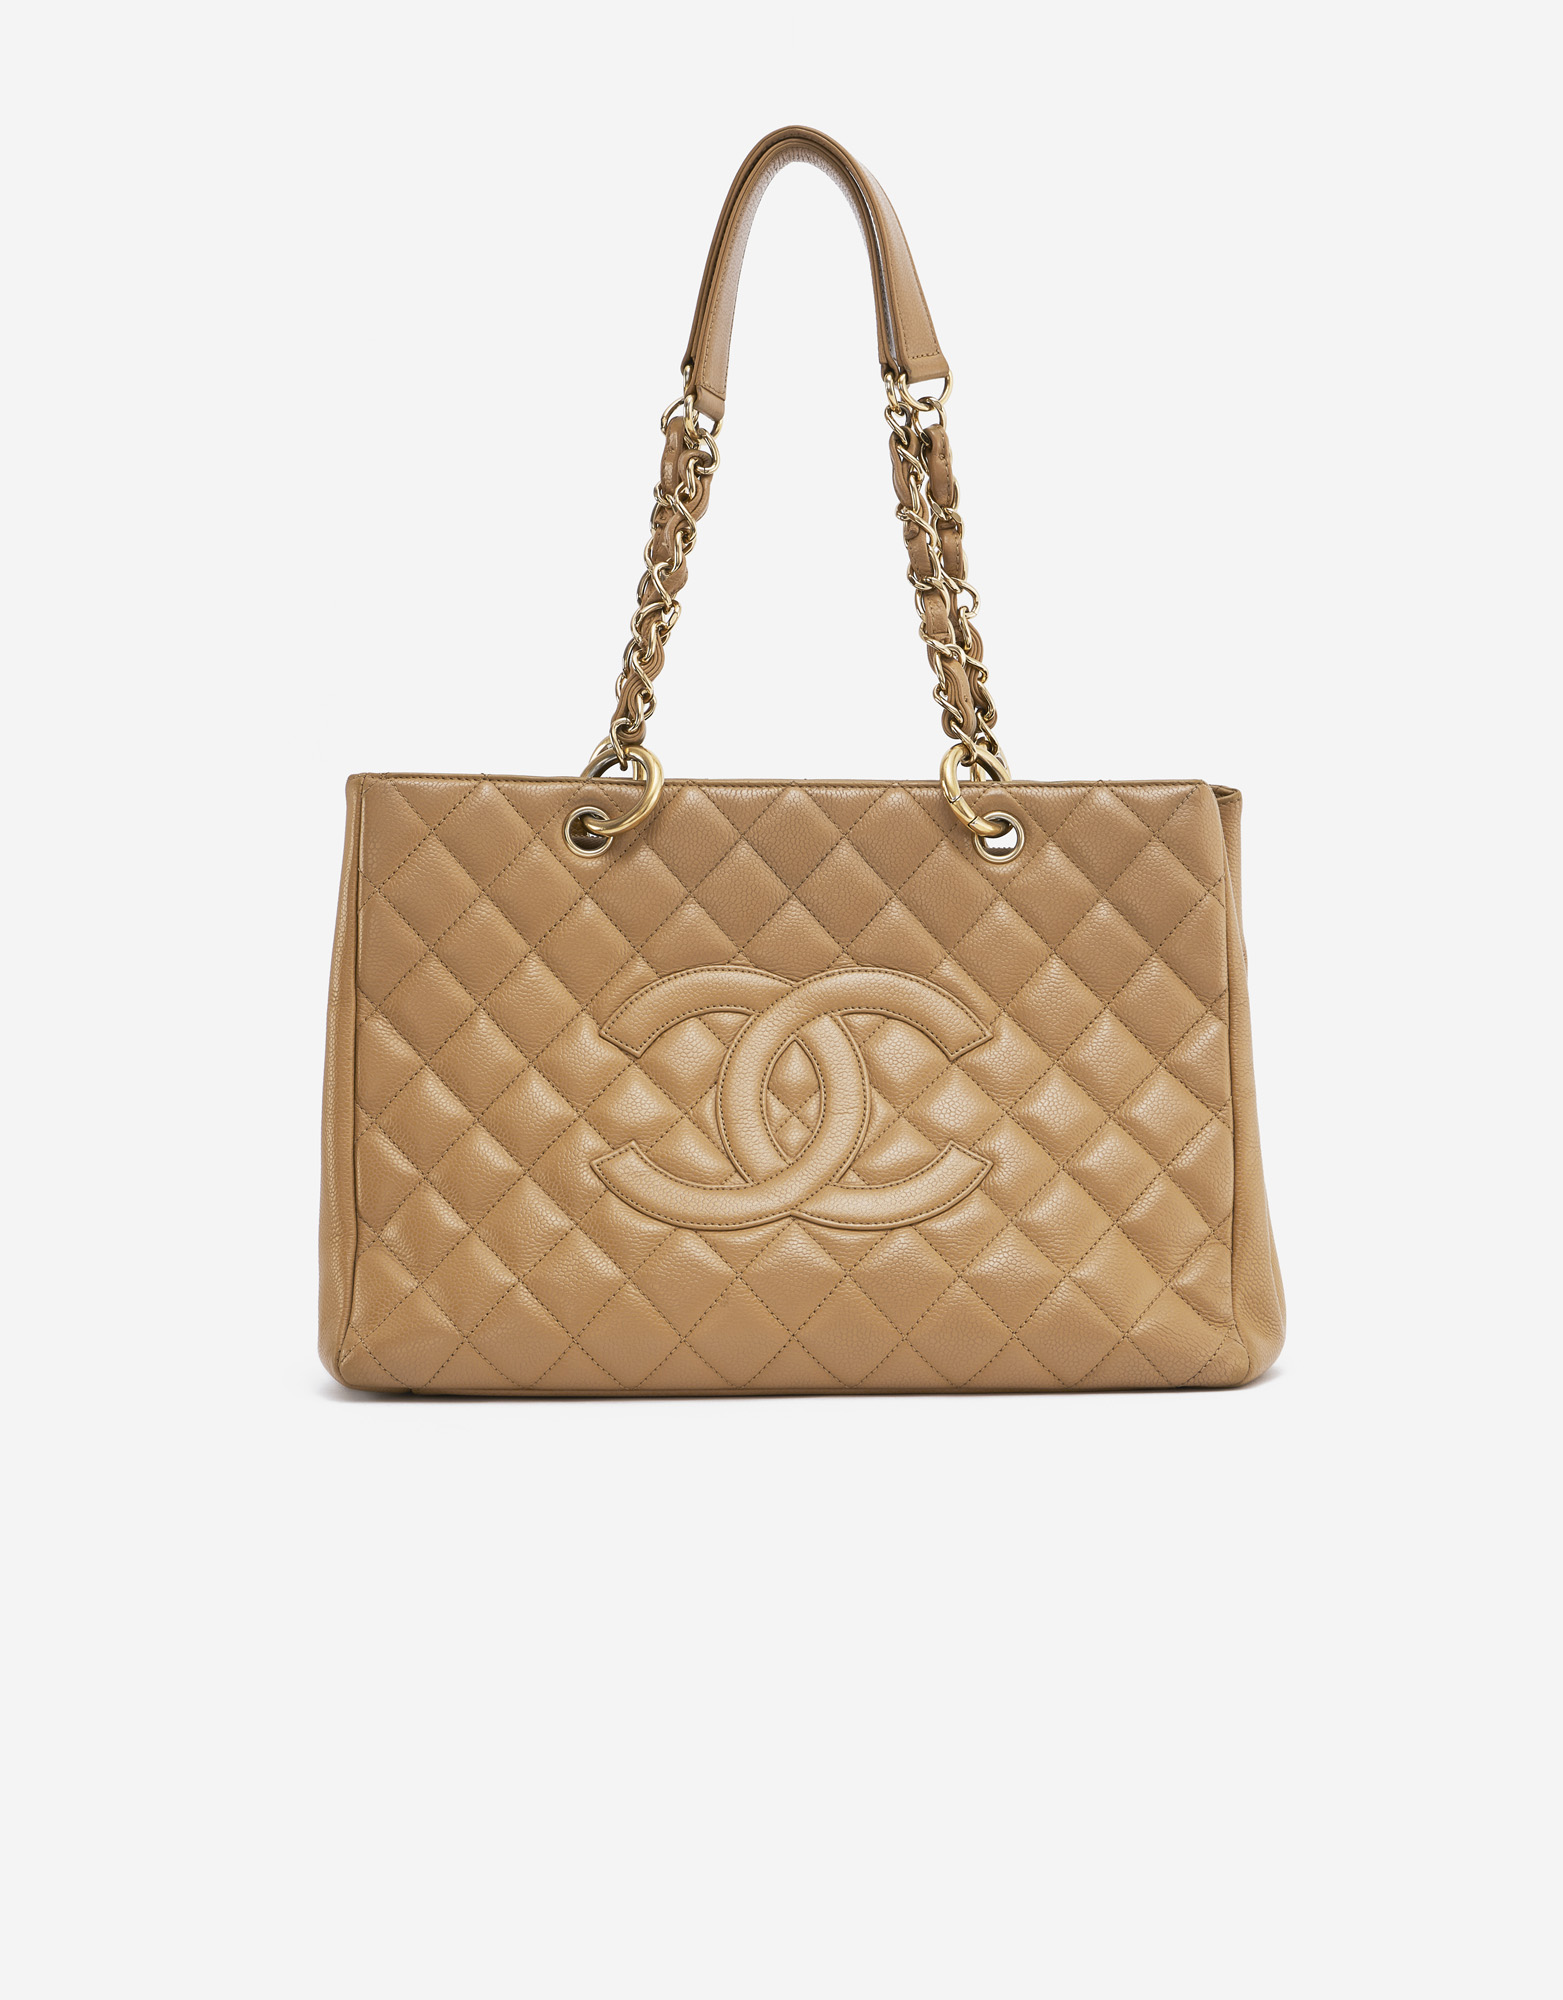 Chanel Shopping Tote Medium Caviar Leather Beige SACLÀB